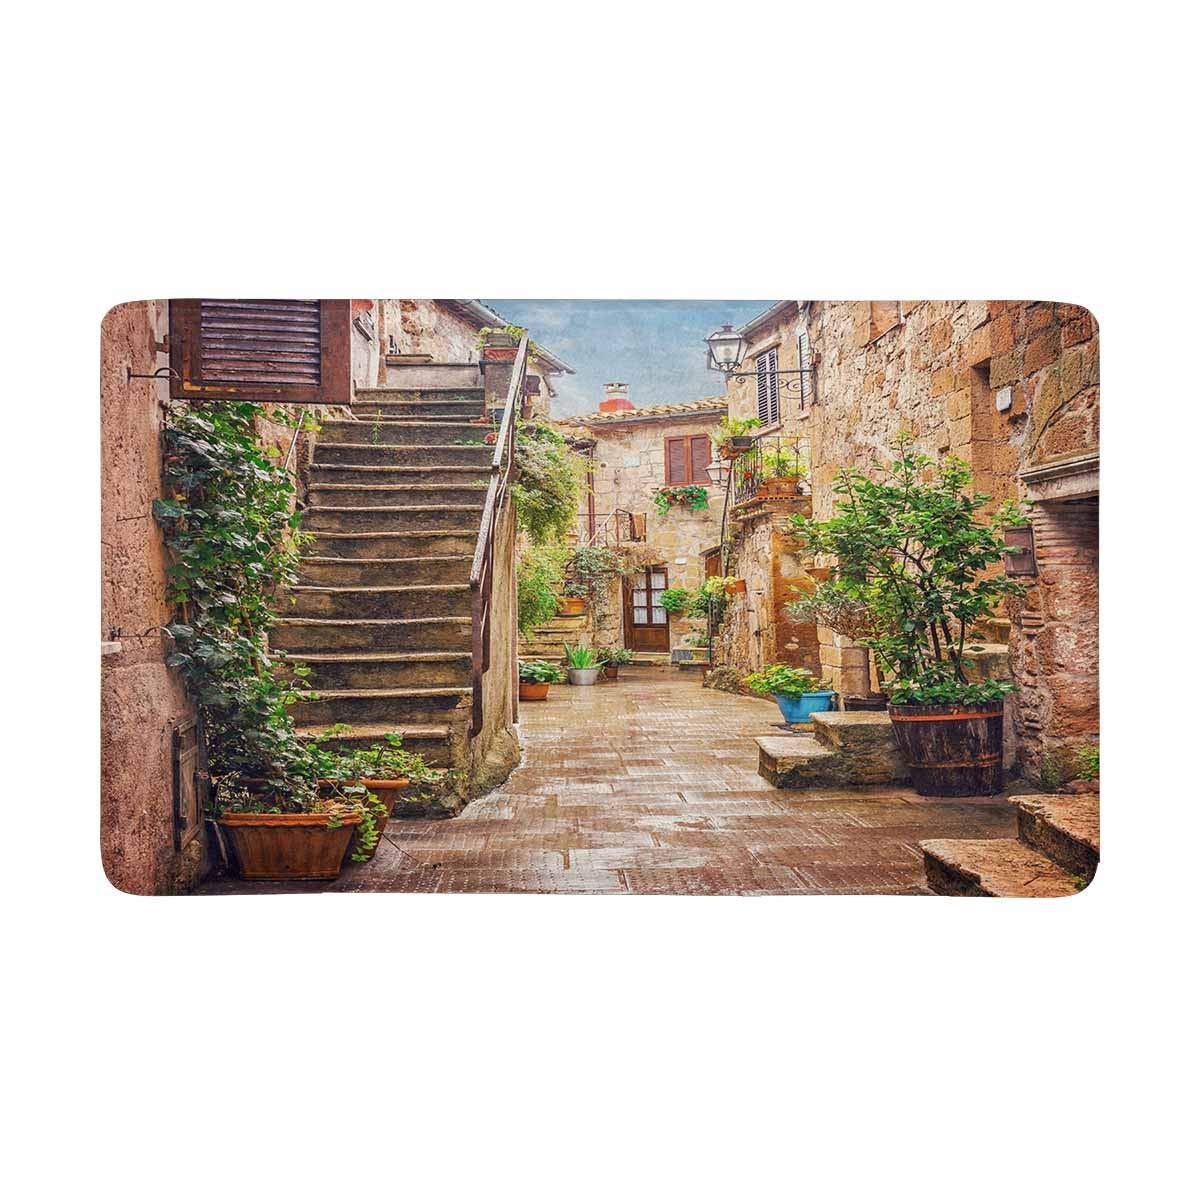 Alley in Old Town Pitigliano Tuscany, итальянский коврик для дома, коврик для входа, коврики для обуви, скребок, дверной коврик, нескользящий домашний декор